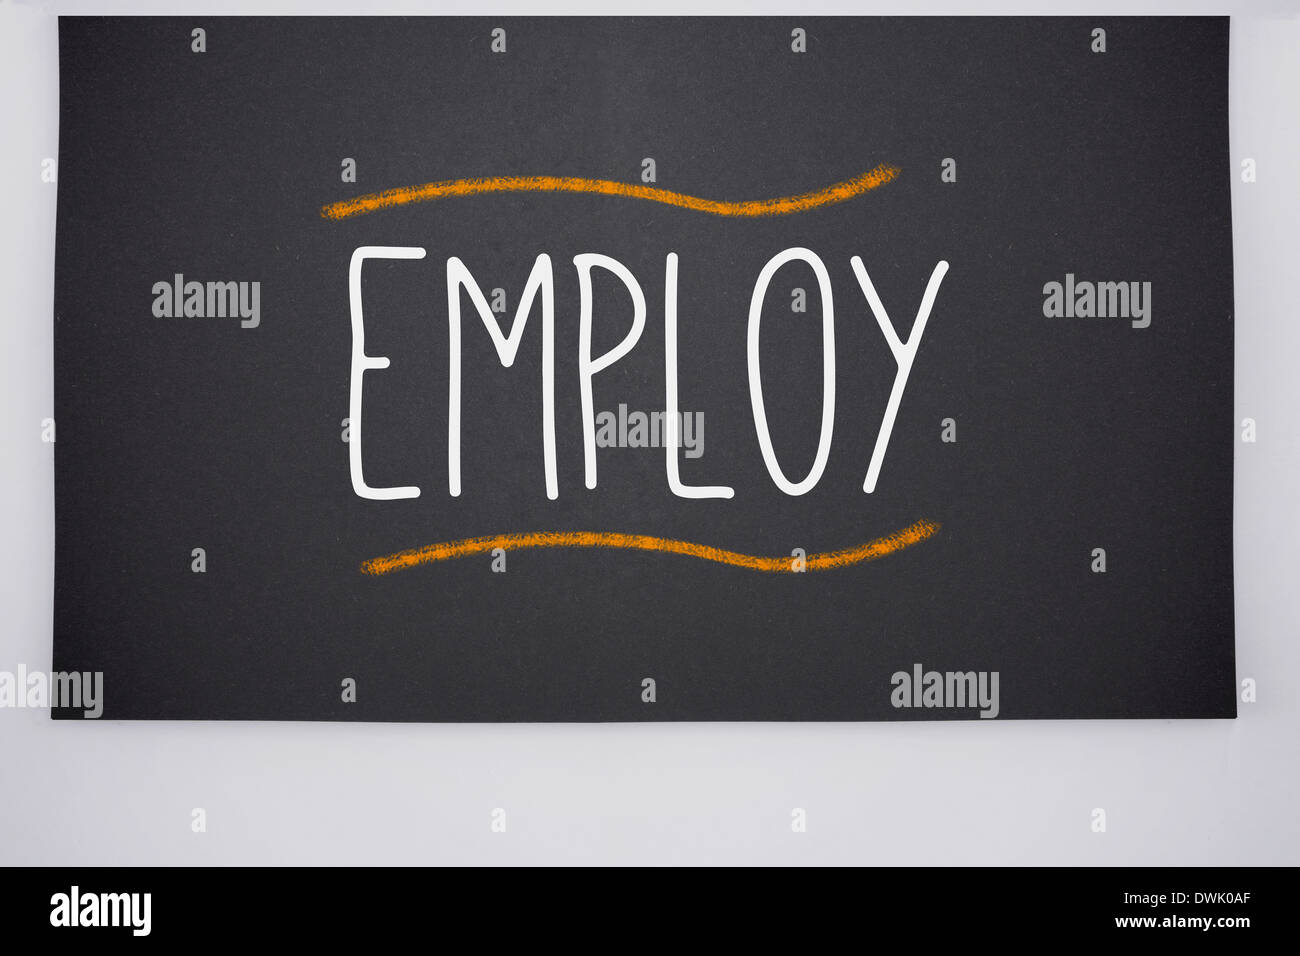 Employ written on big blackboard - Stock Image